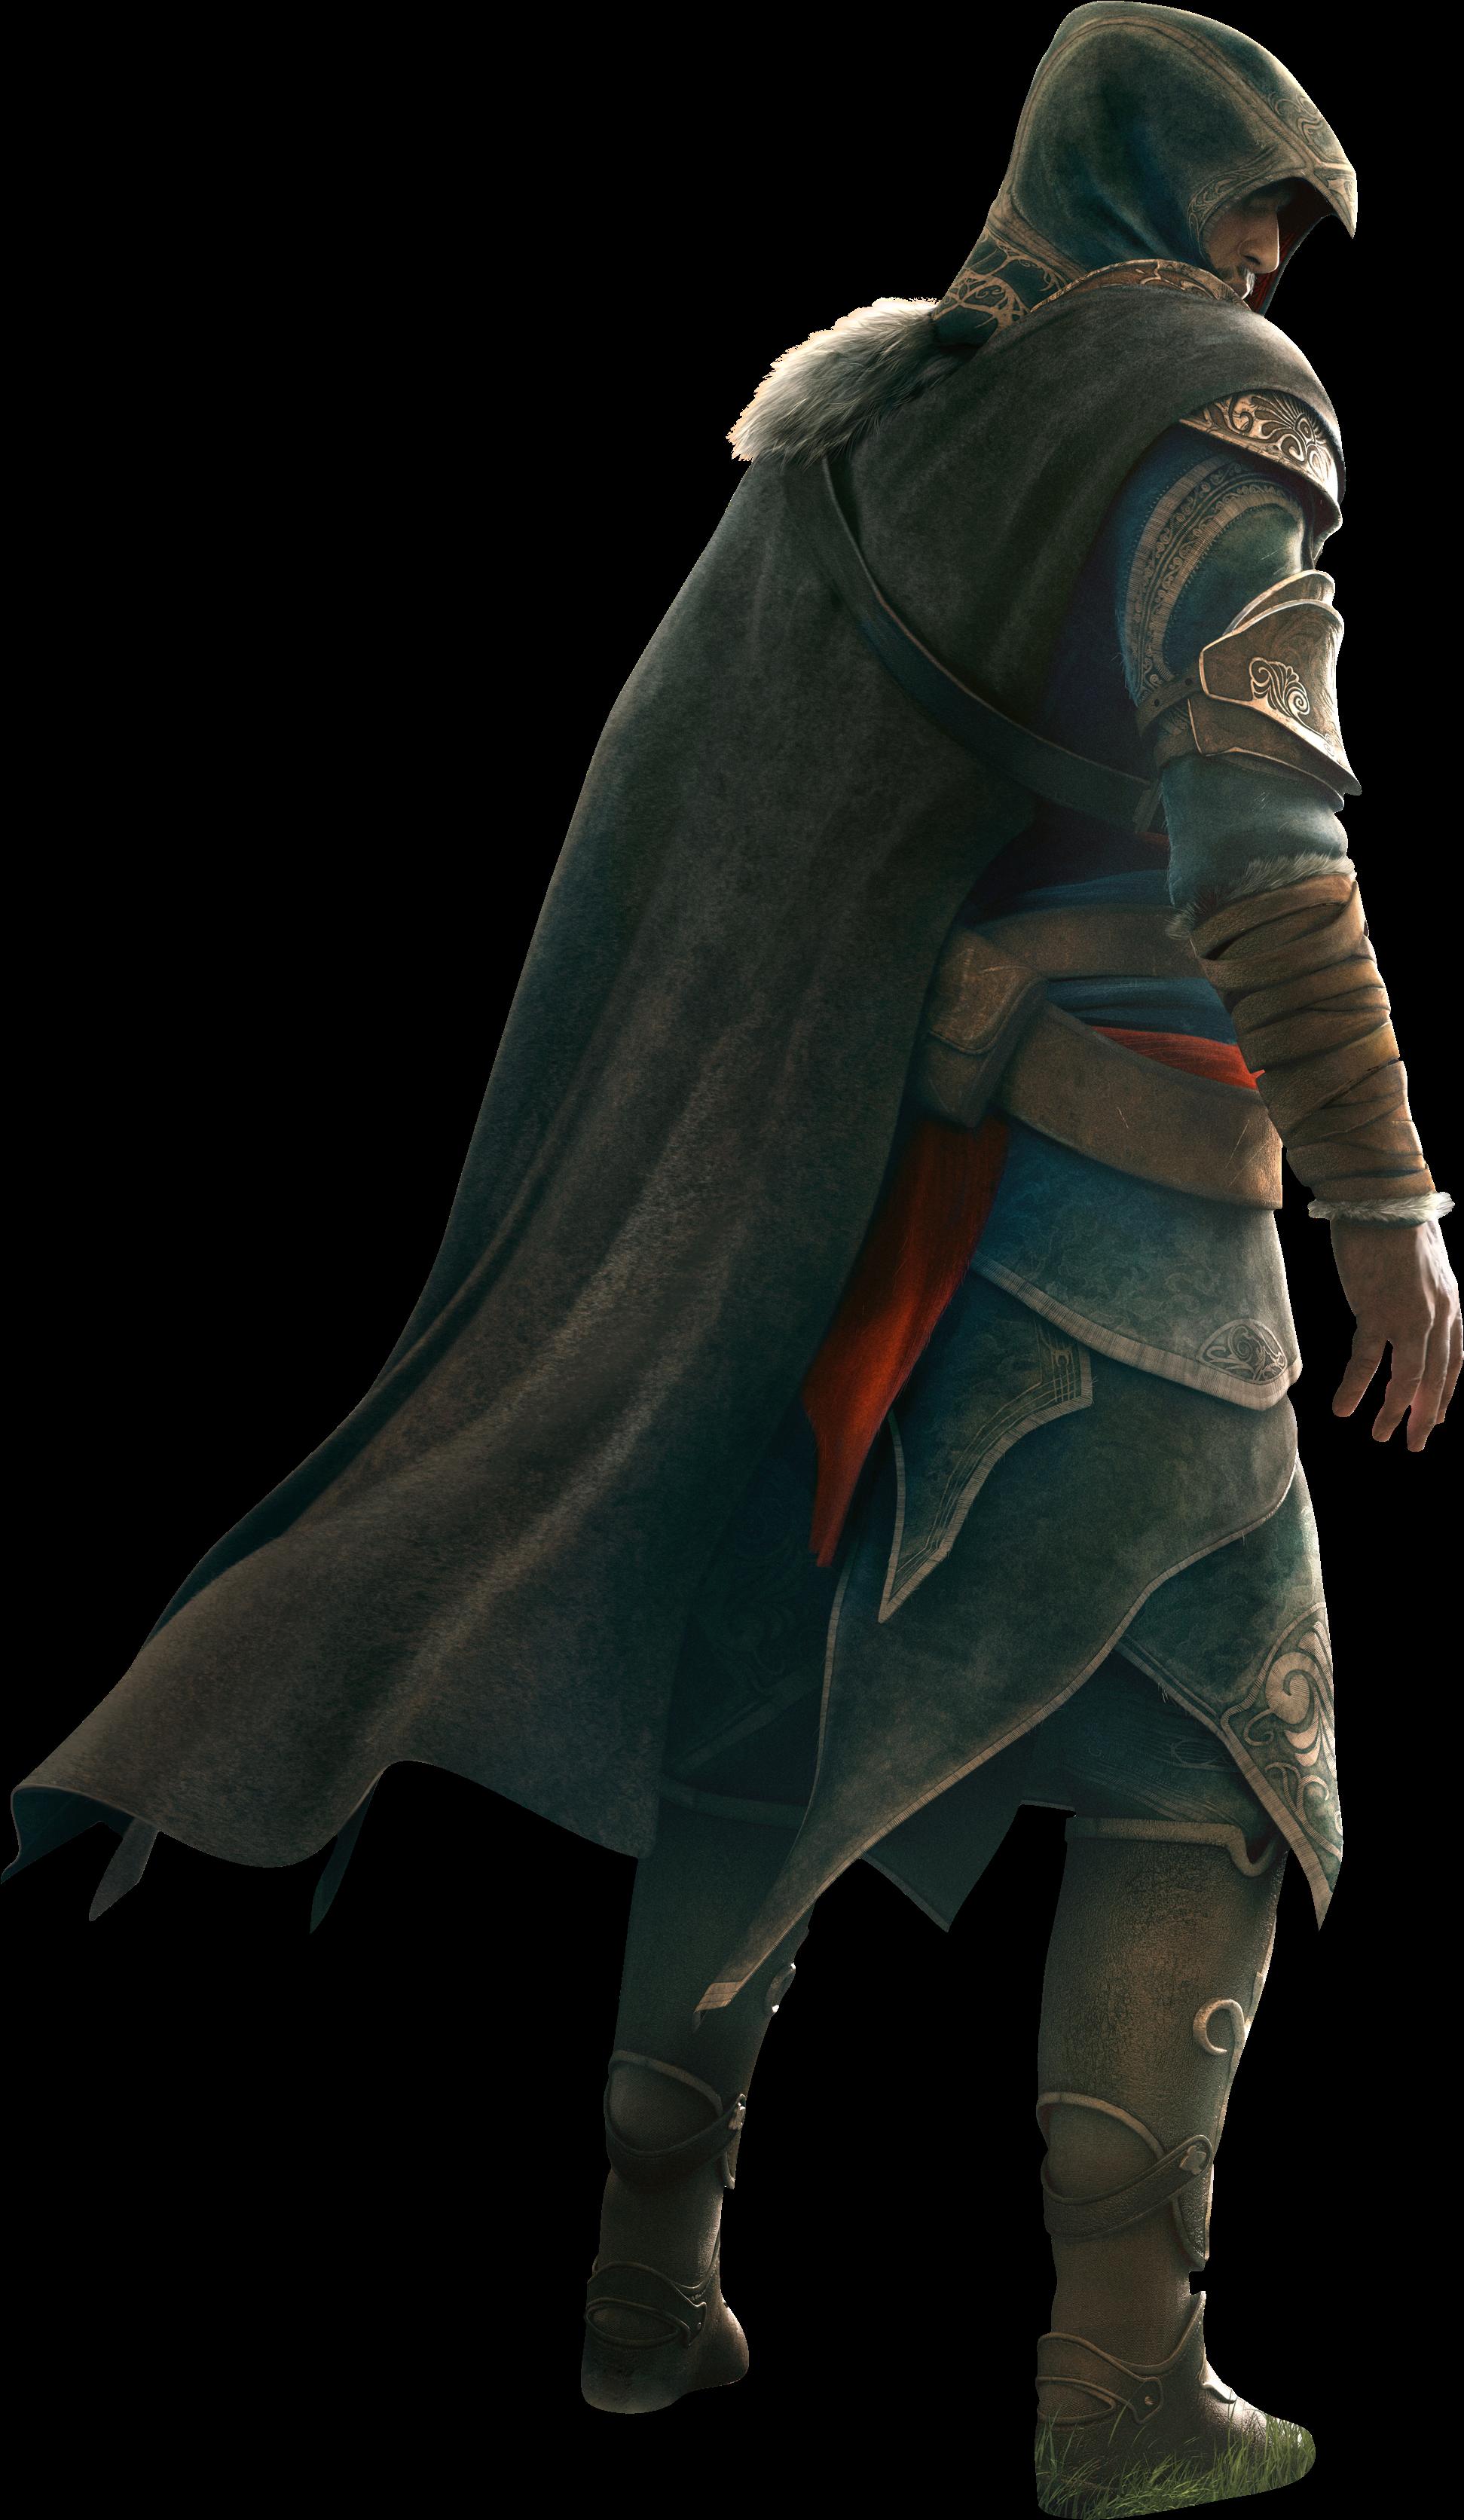 Acr Revelations Ezio Render - Assassin's Creed Ezio Png (1984x3418), Png Download